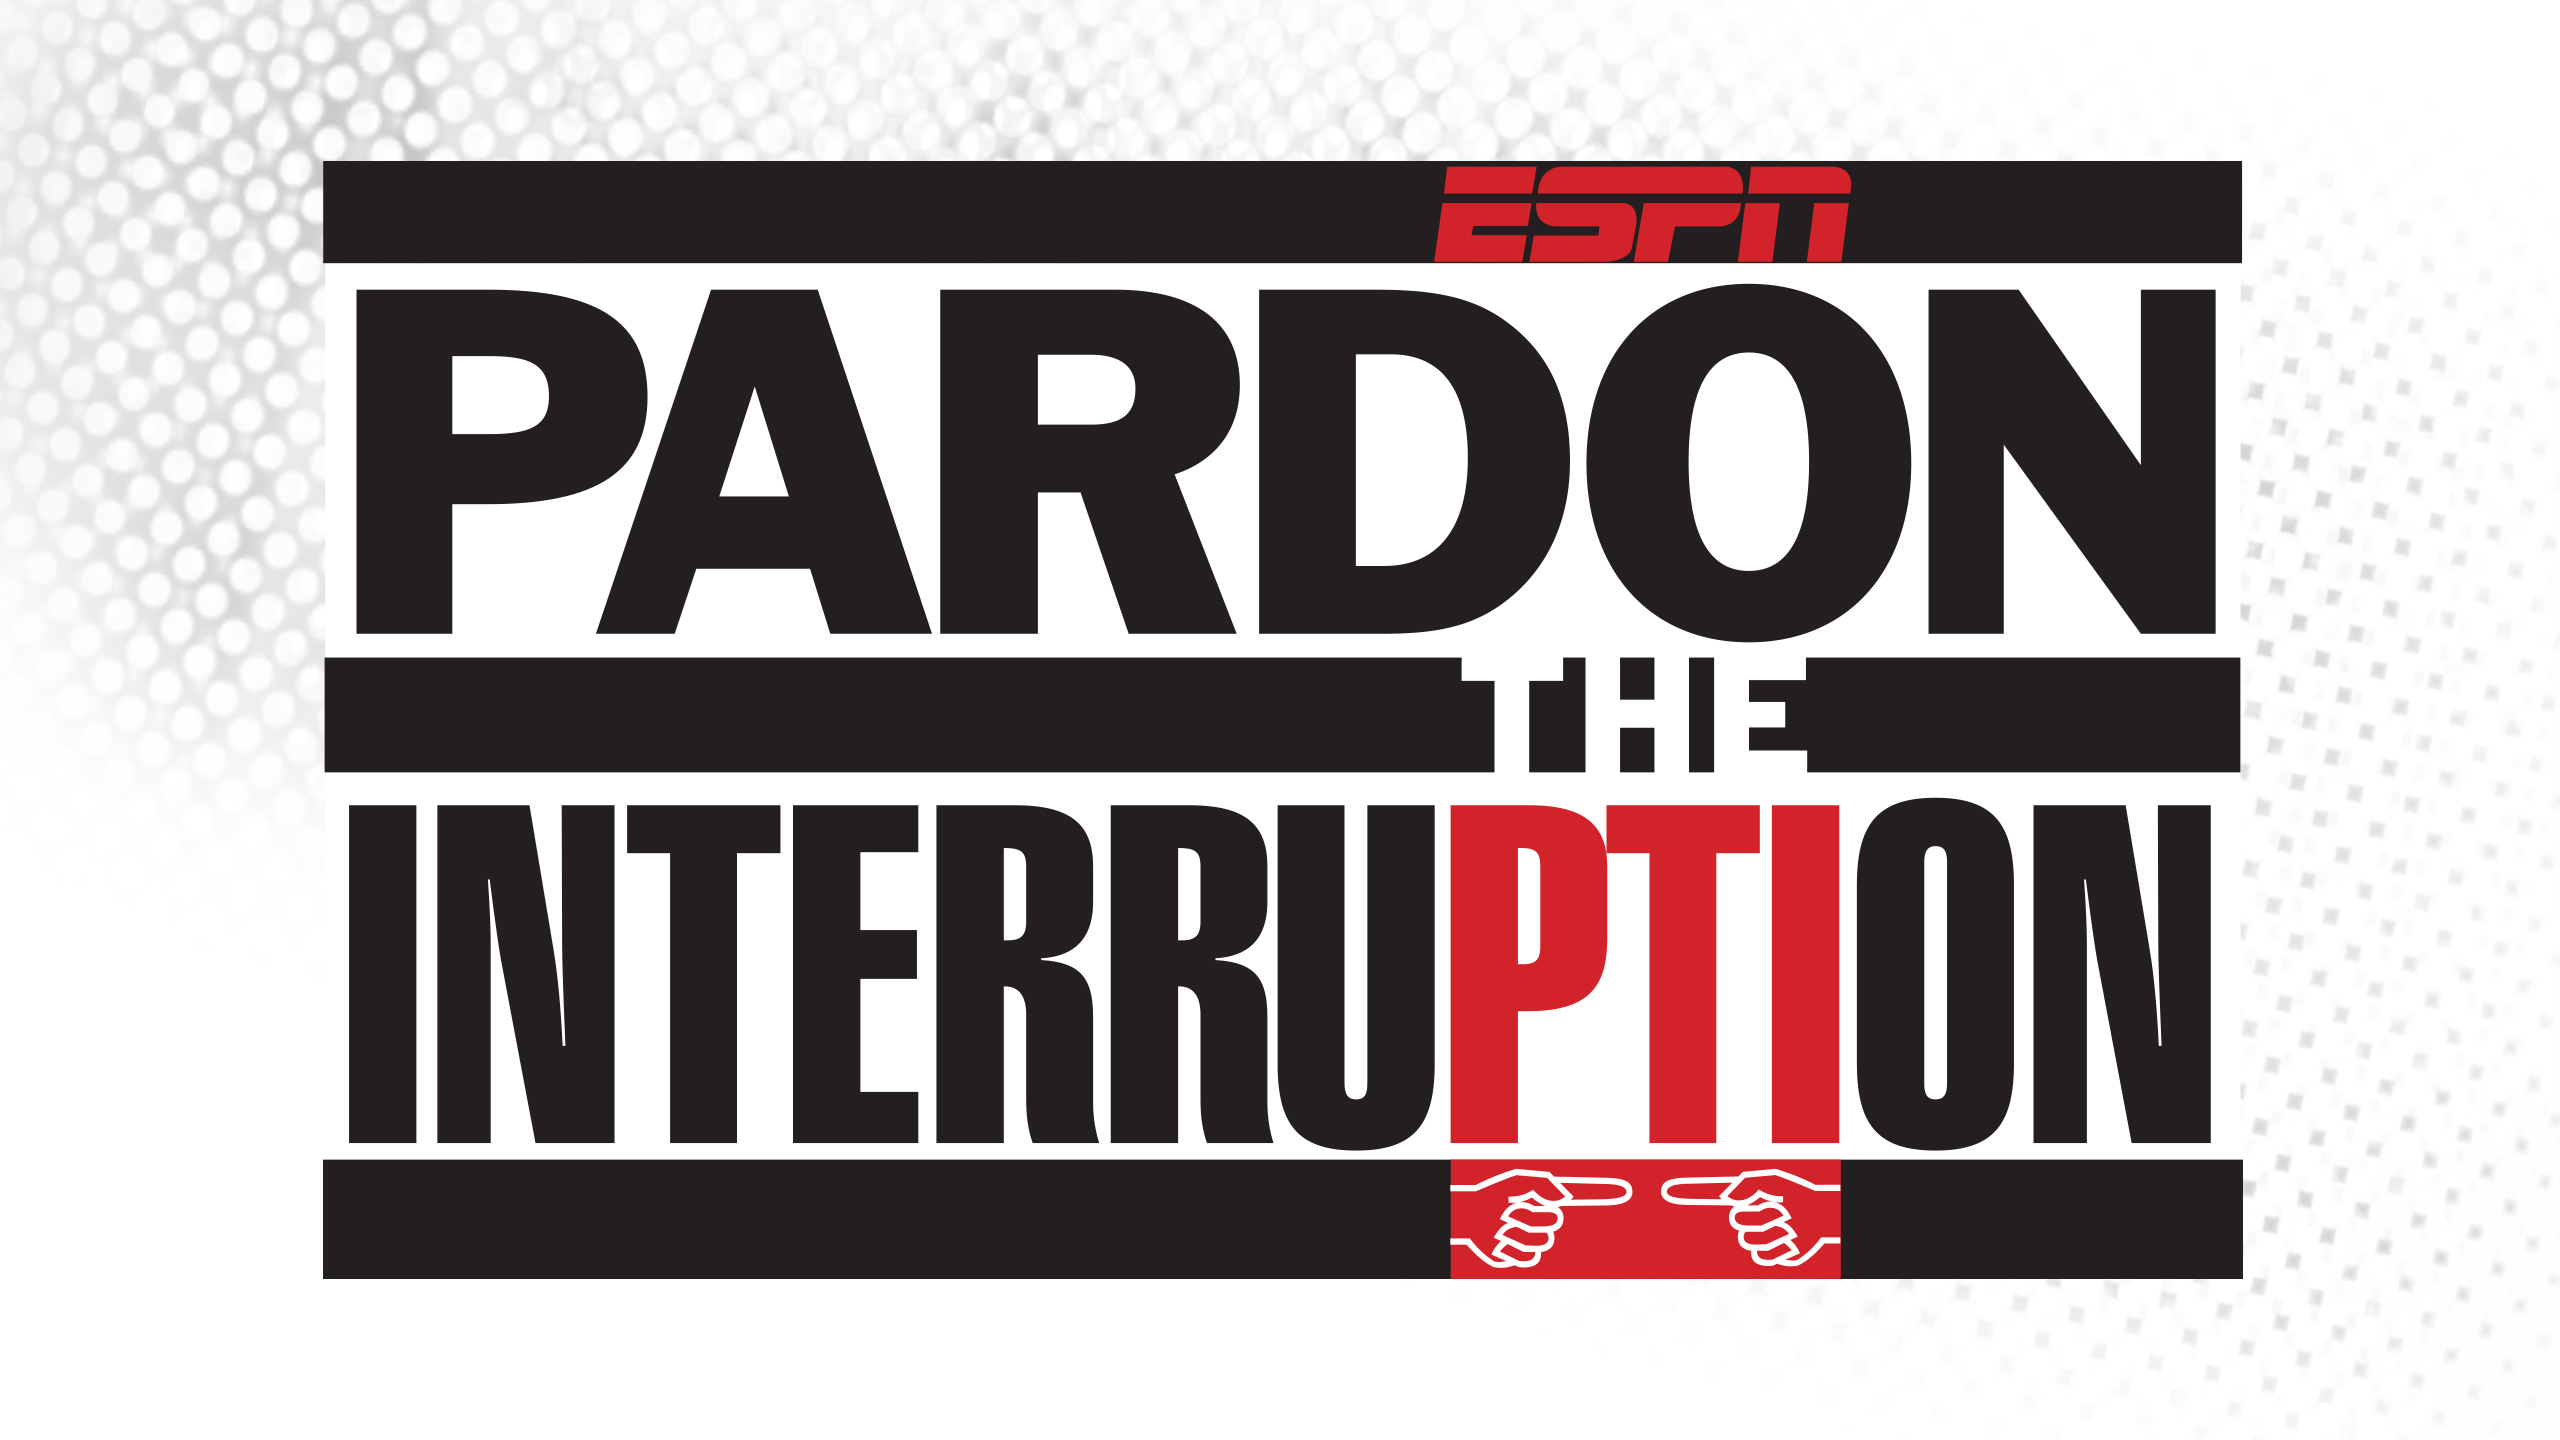 Wed, 11/14 - Pardon The Interruption